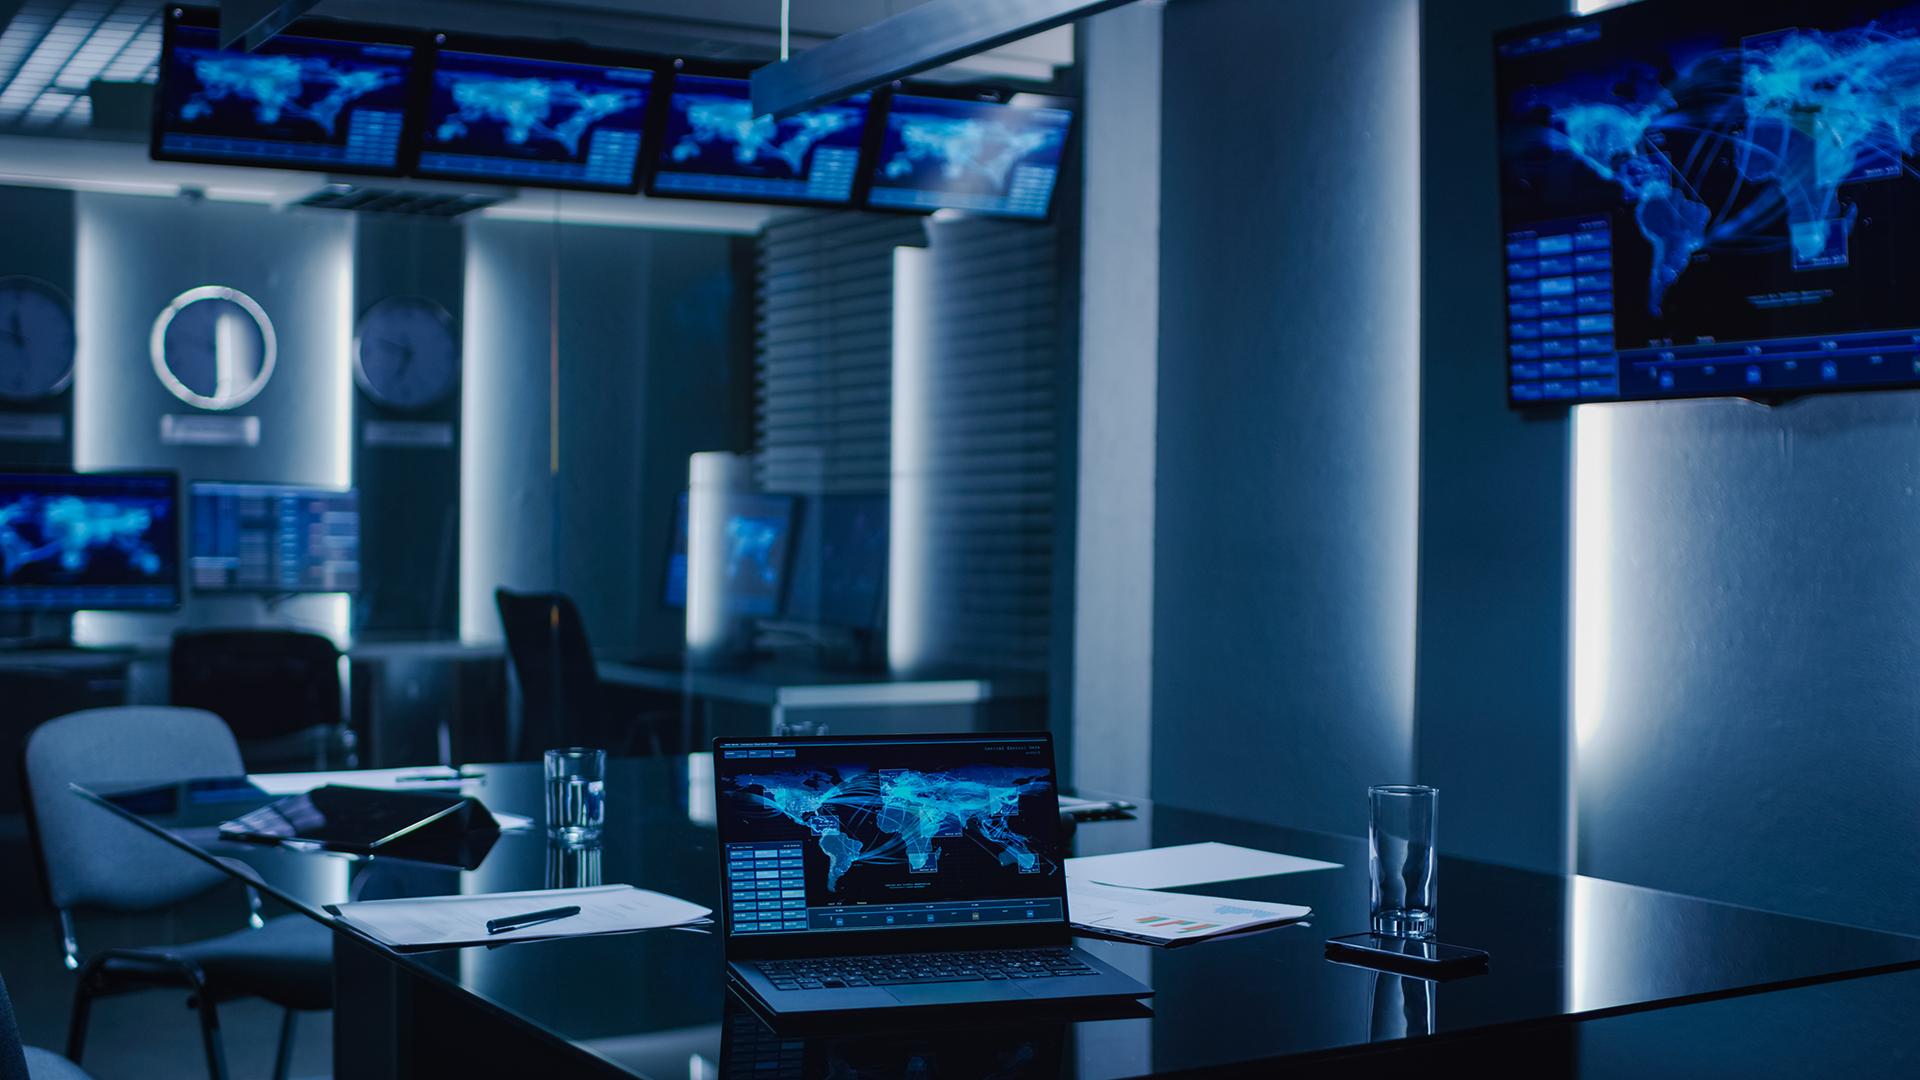 Longer Disruptions Shift Business Critical Prioritiesto Mission Critical